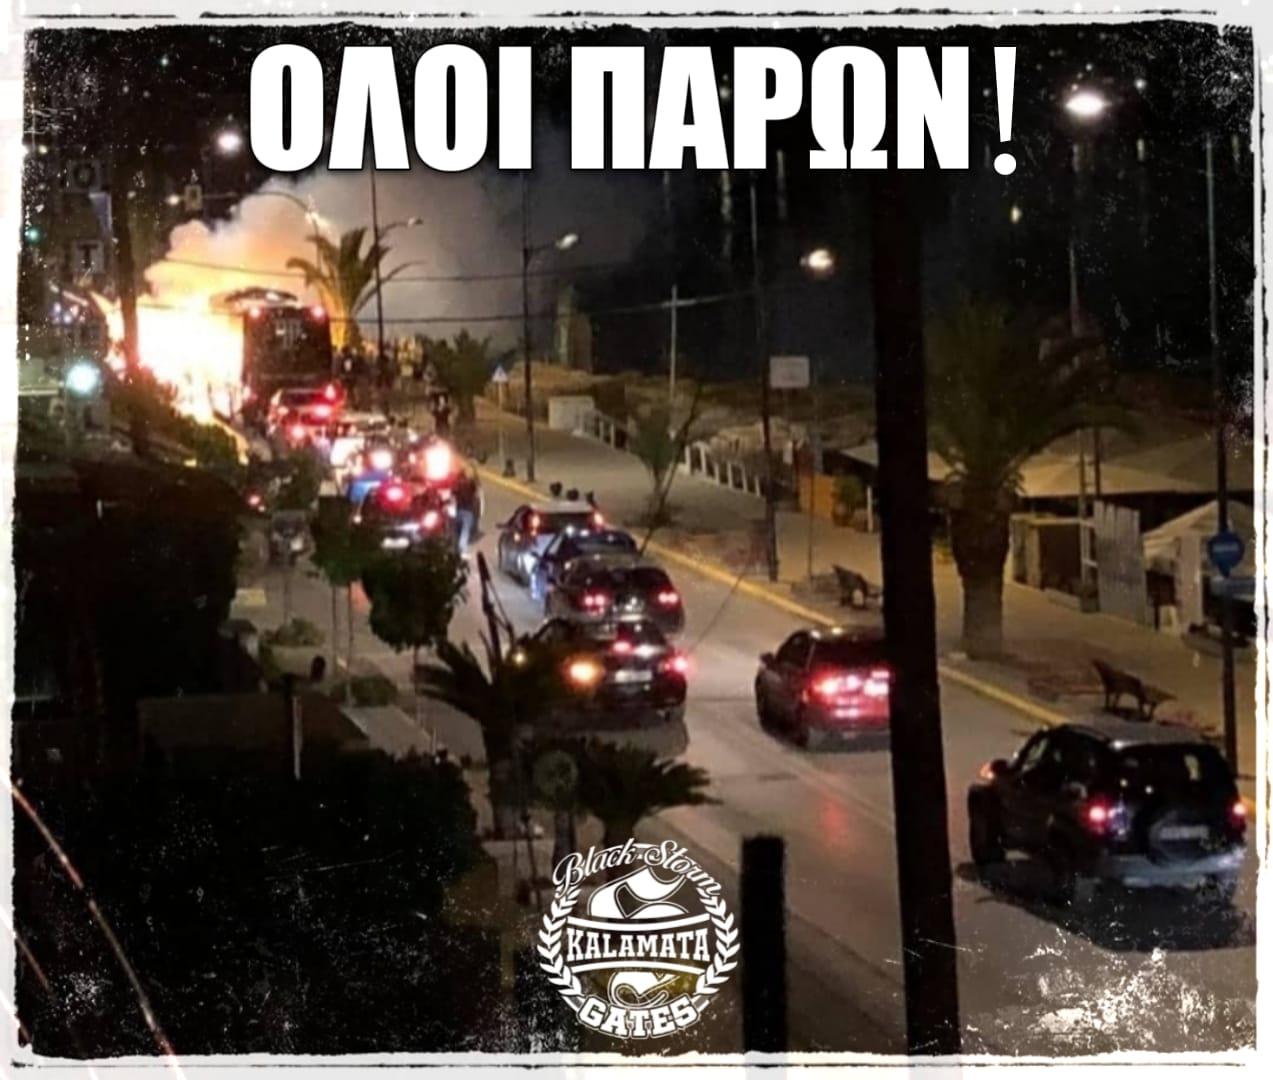 """Kalamata Gate 5 official"": ""Όλοι εκεί! Θα γίνει η νύχτα μέρα, θα καεί η Καλαμάτα στη φιέστα της Μαύρης Θύελλας""!"